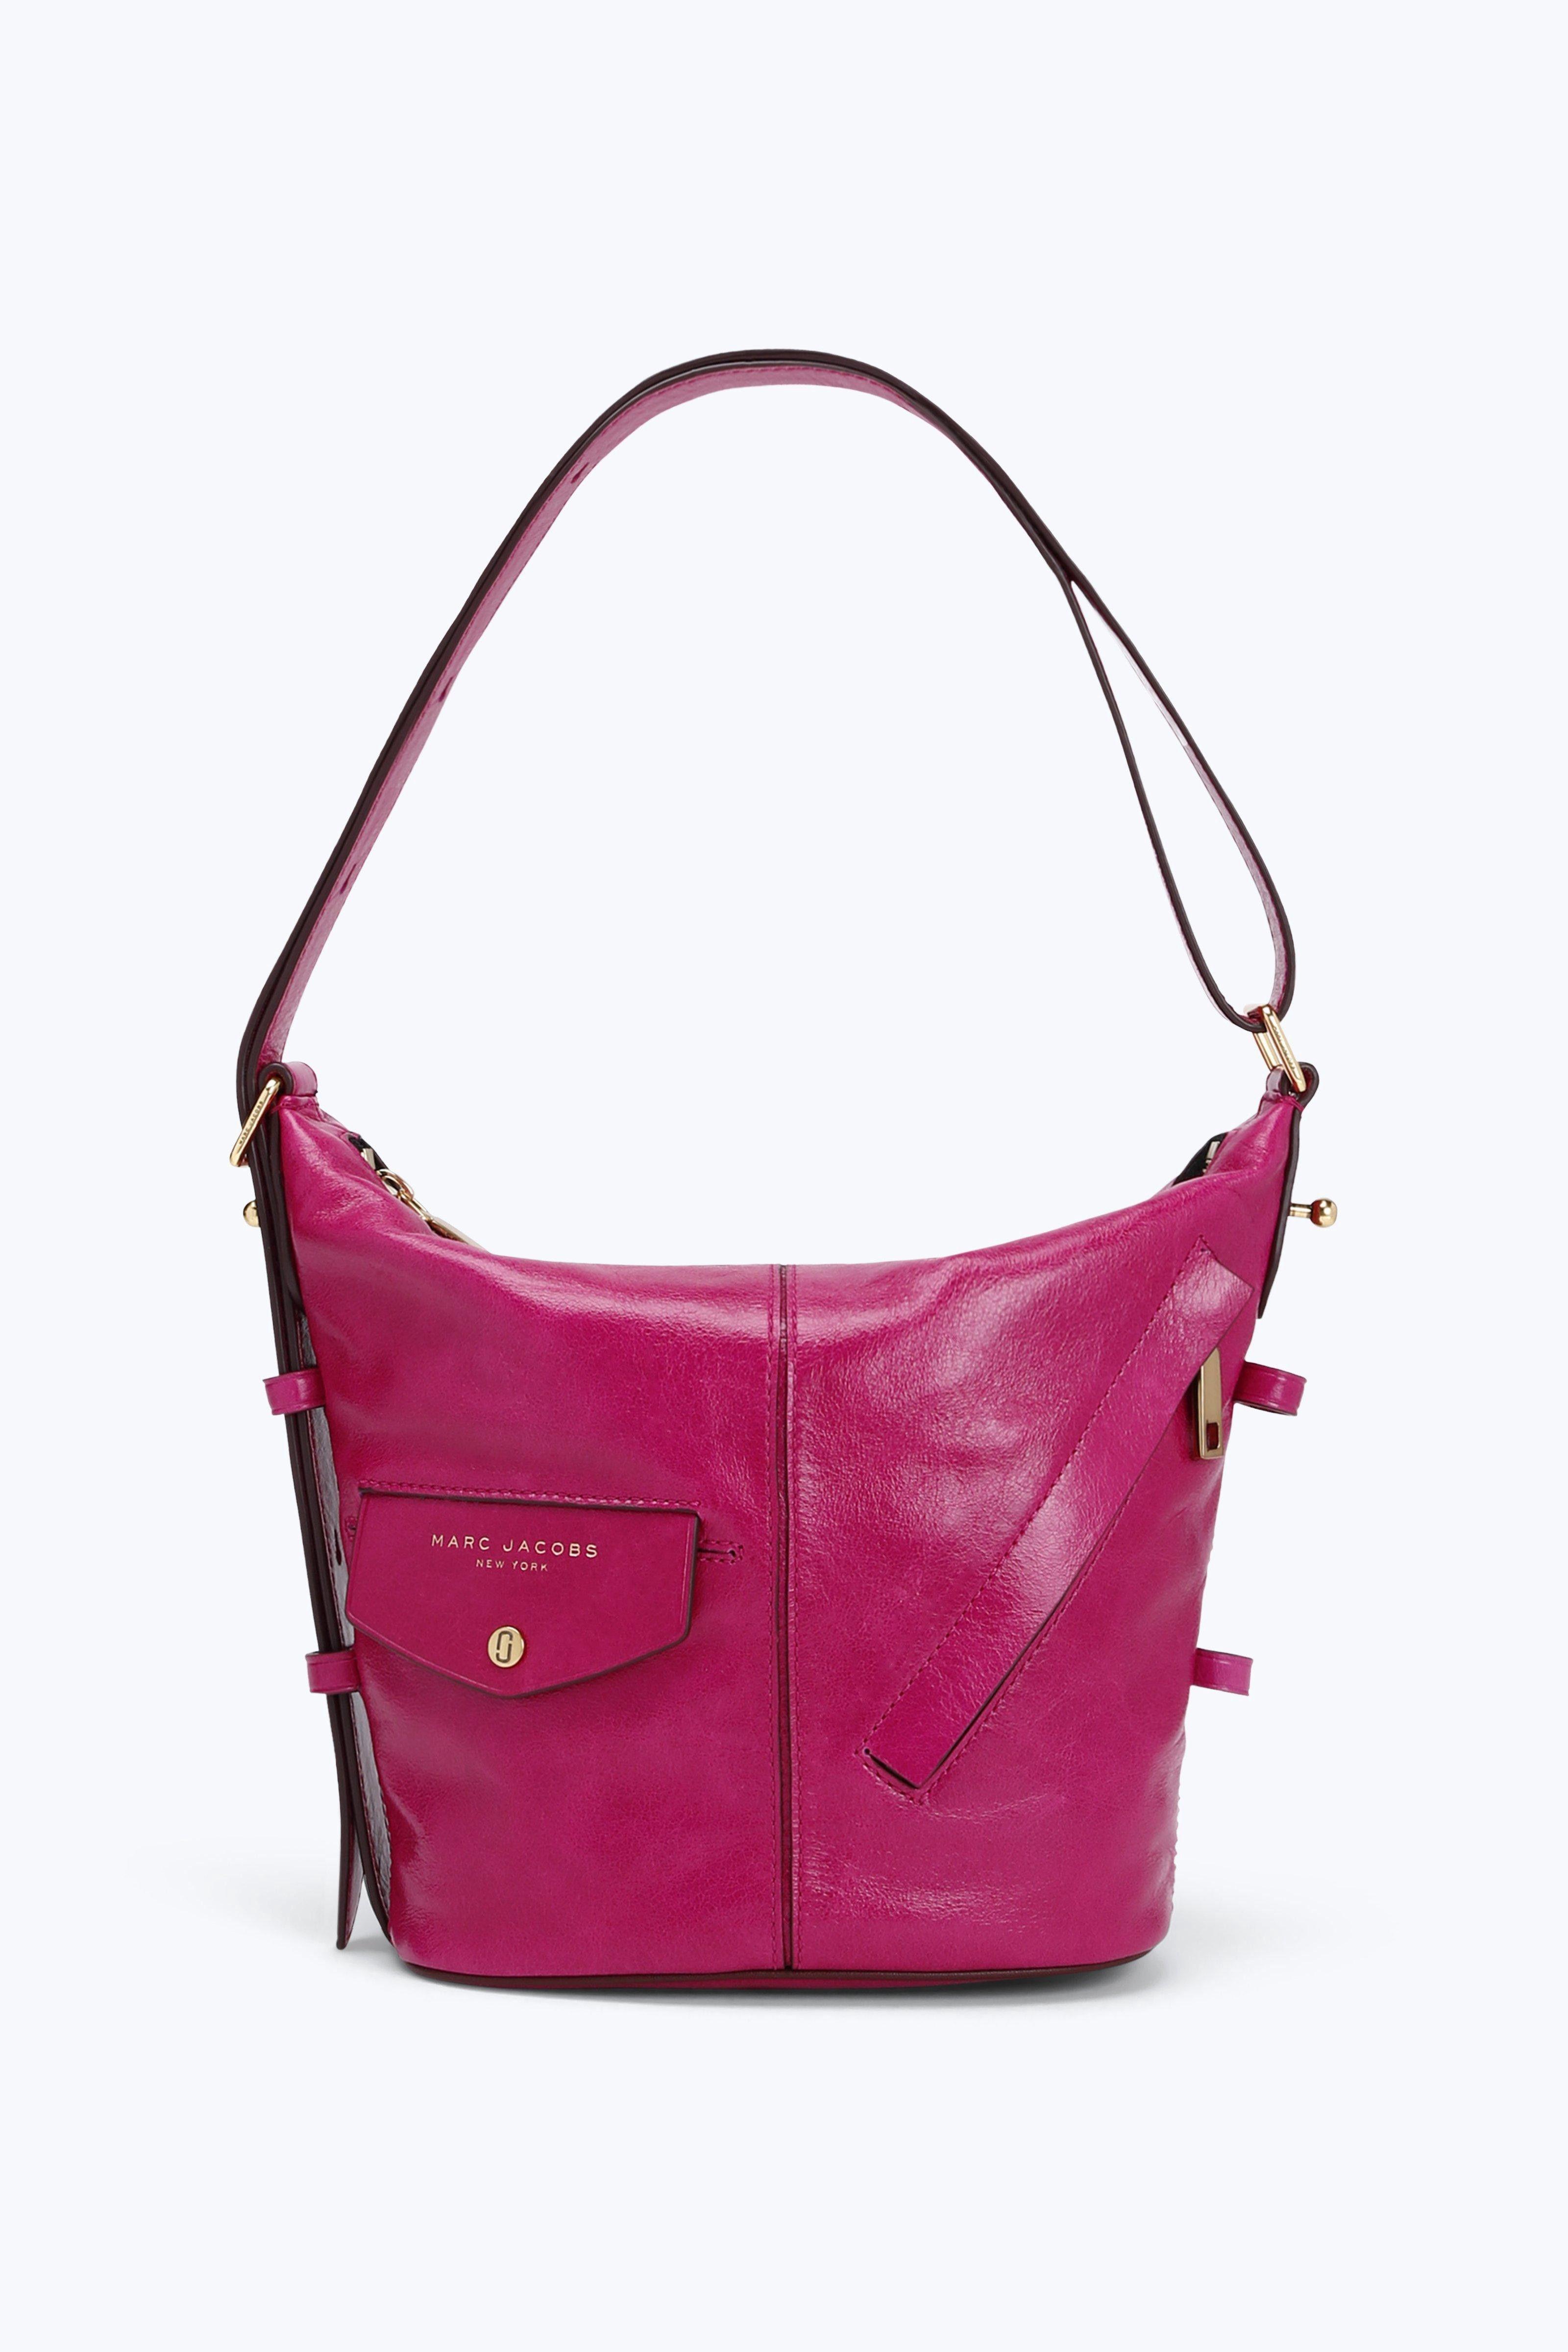 Vintage Marc Jacob Shoulder Bag In 2020 Marc Jacobs Bag Bags Clothes Design